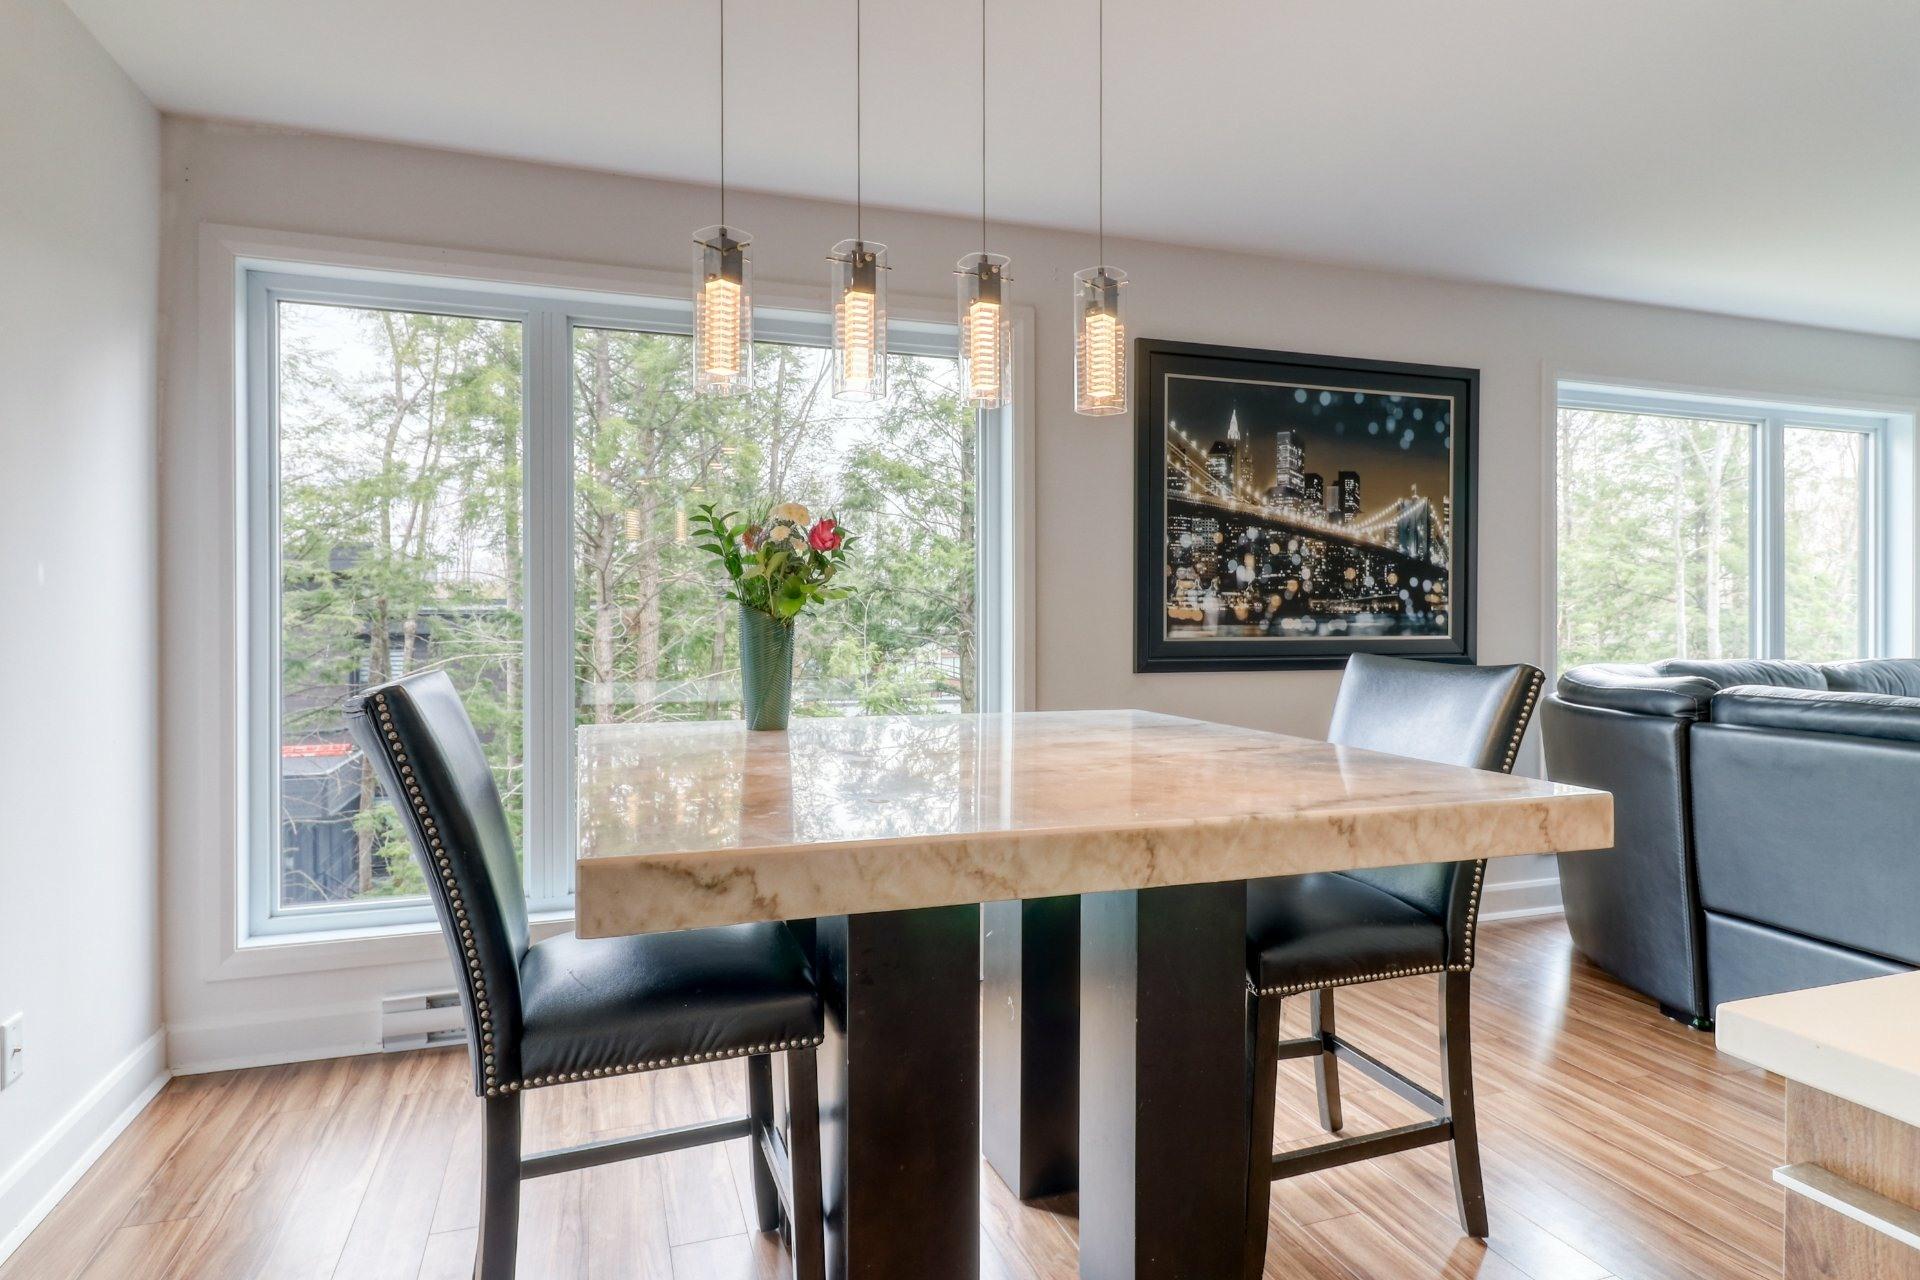 image 8 - Apartment For sale Blainville - 8 rooms